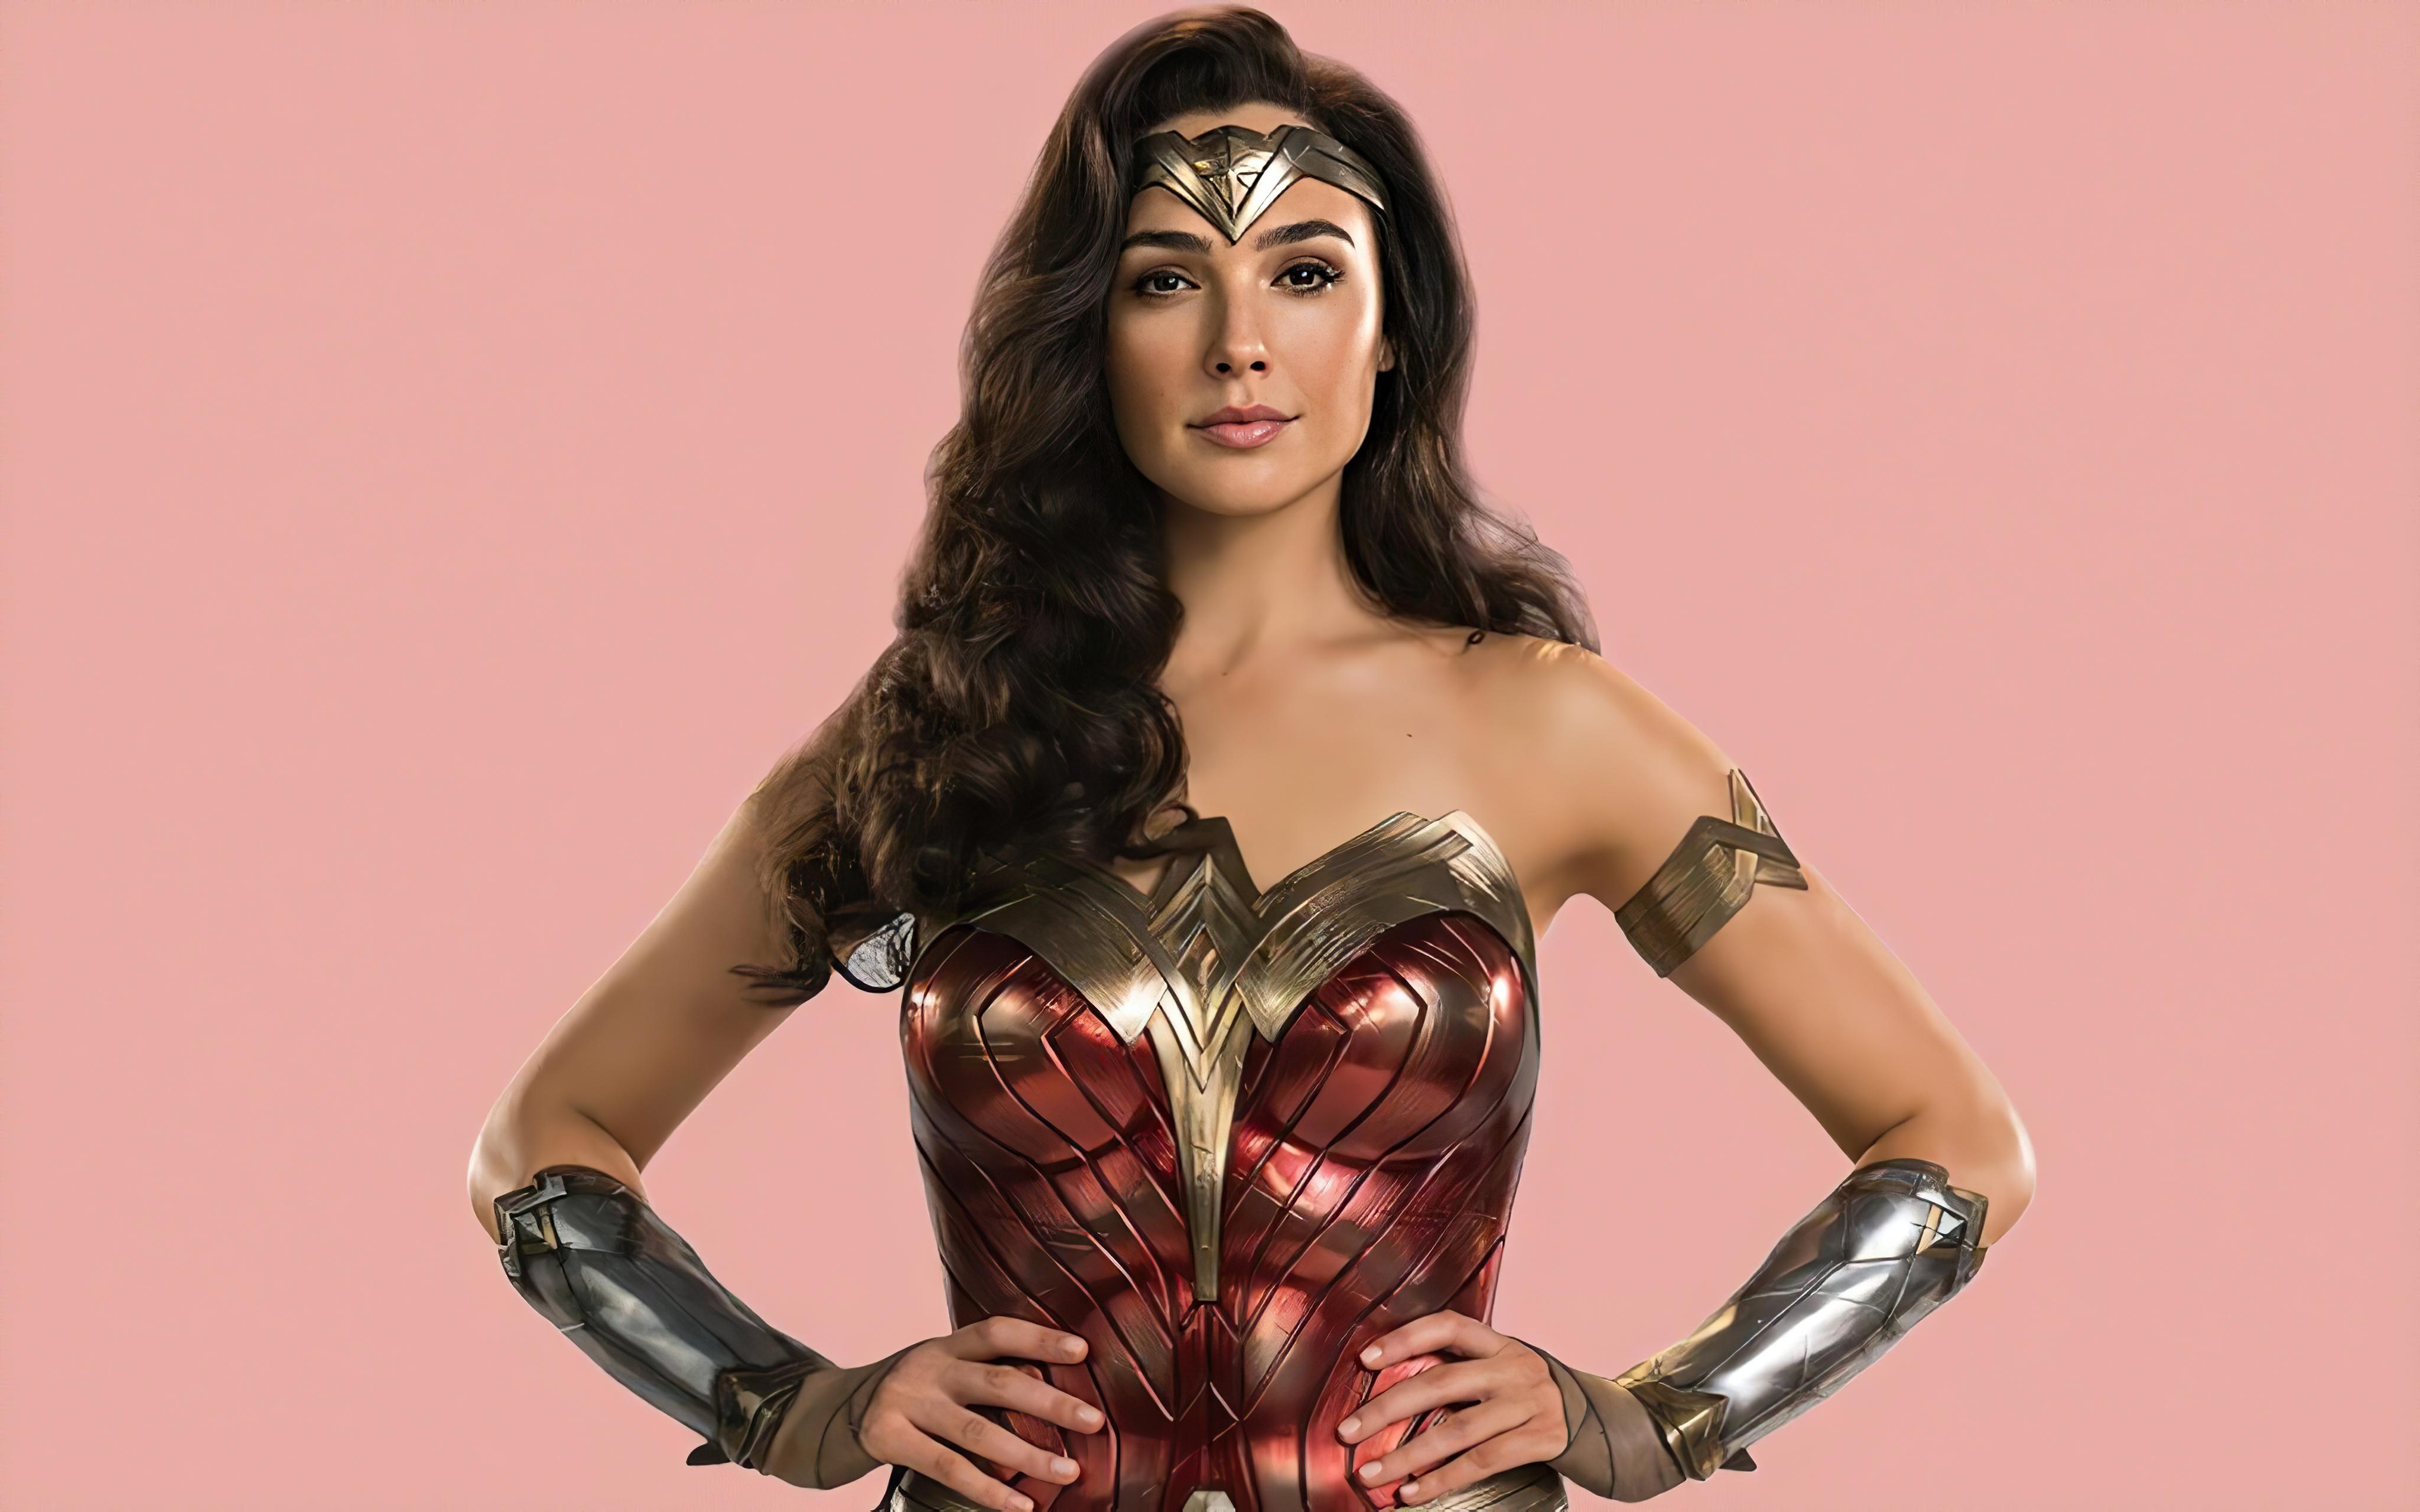 4k Wonder Woman 84, HD Movies, 4k Wallpapers, Images